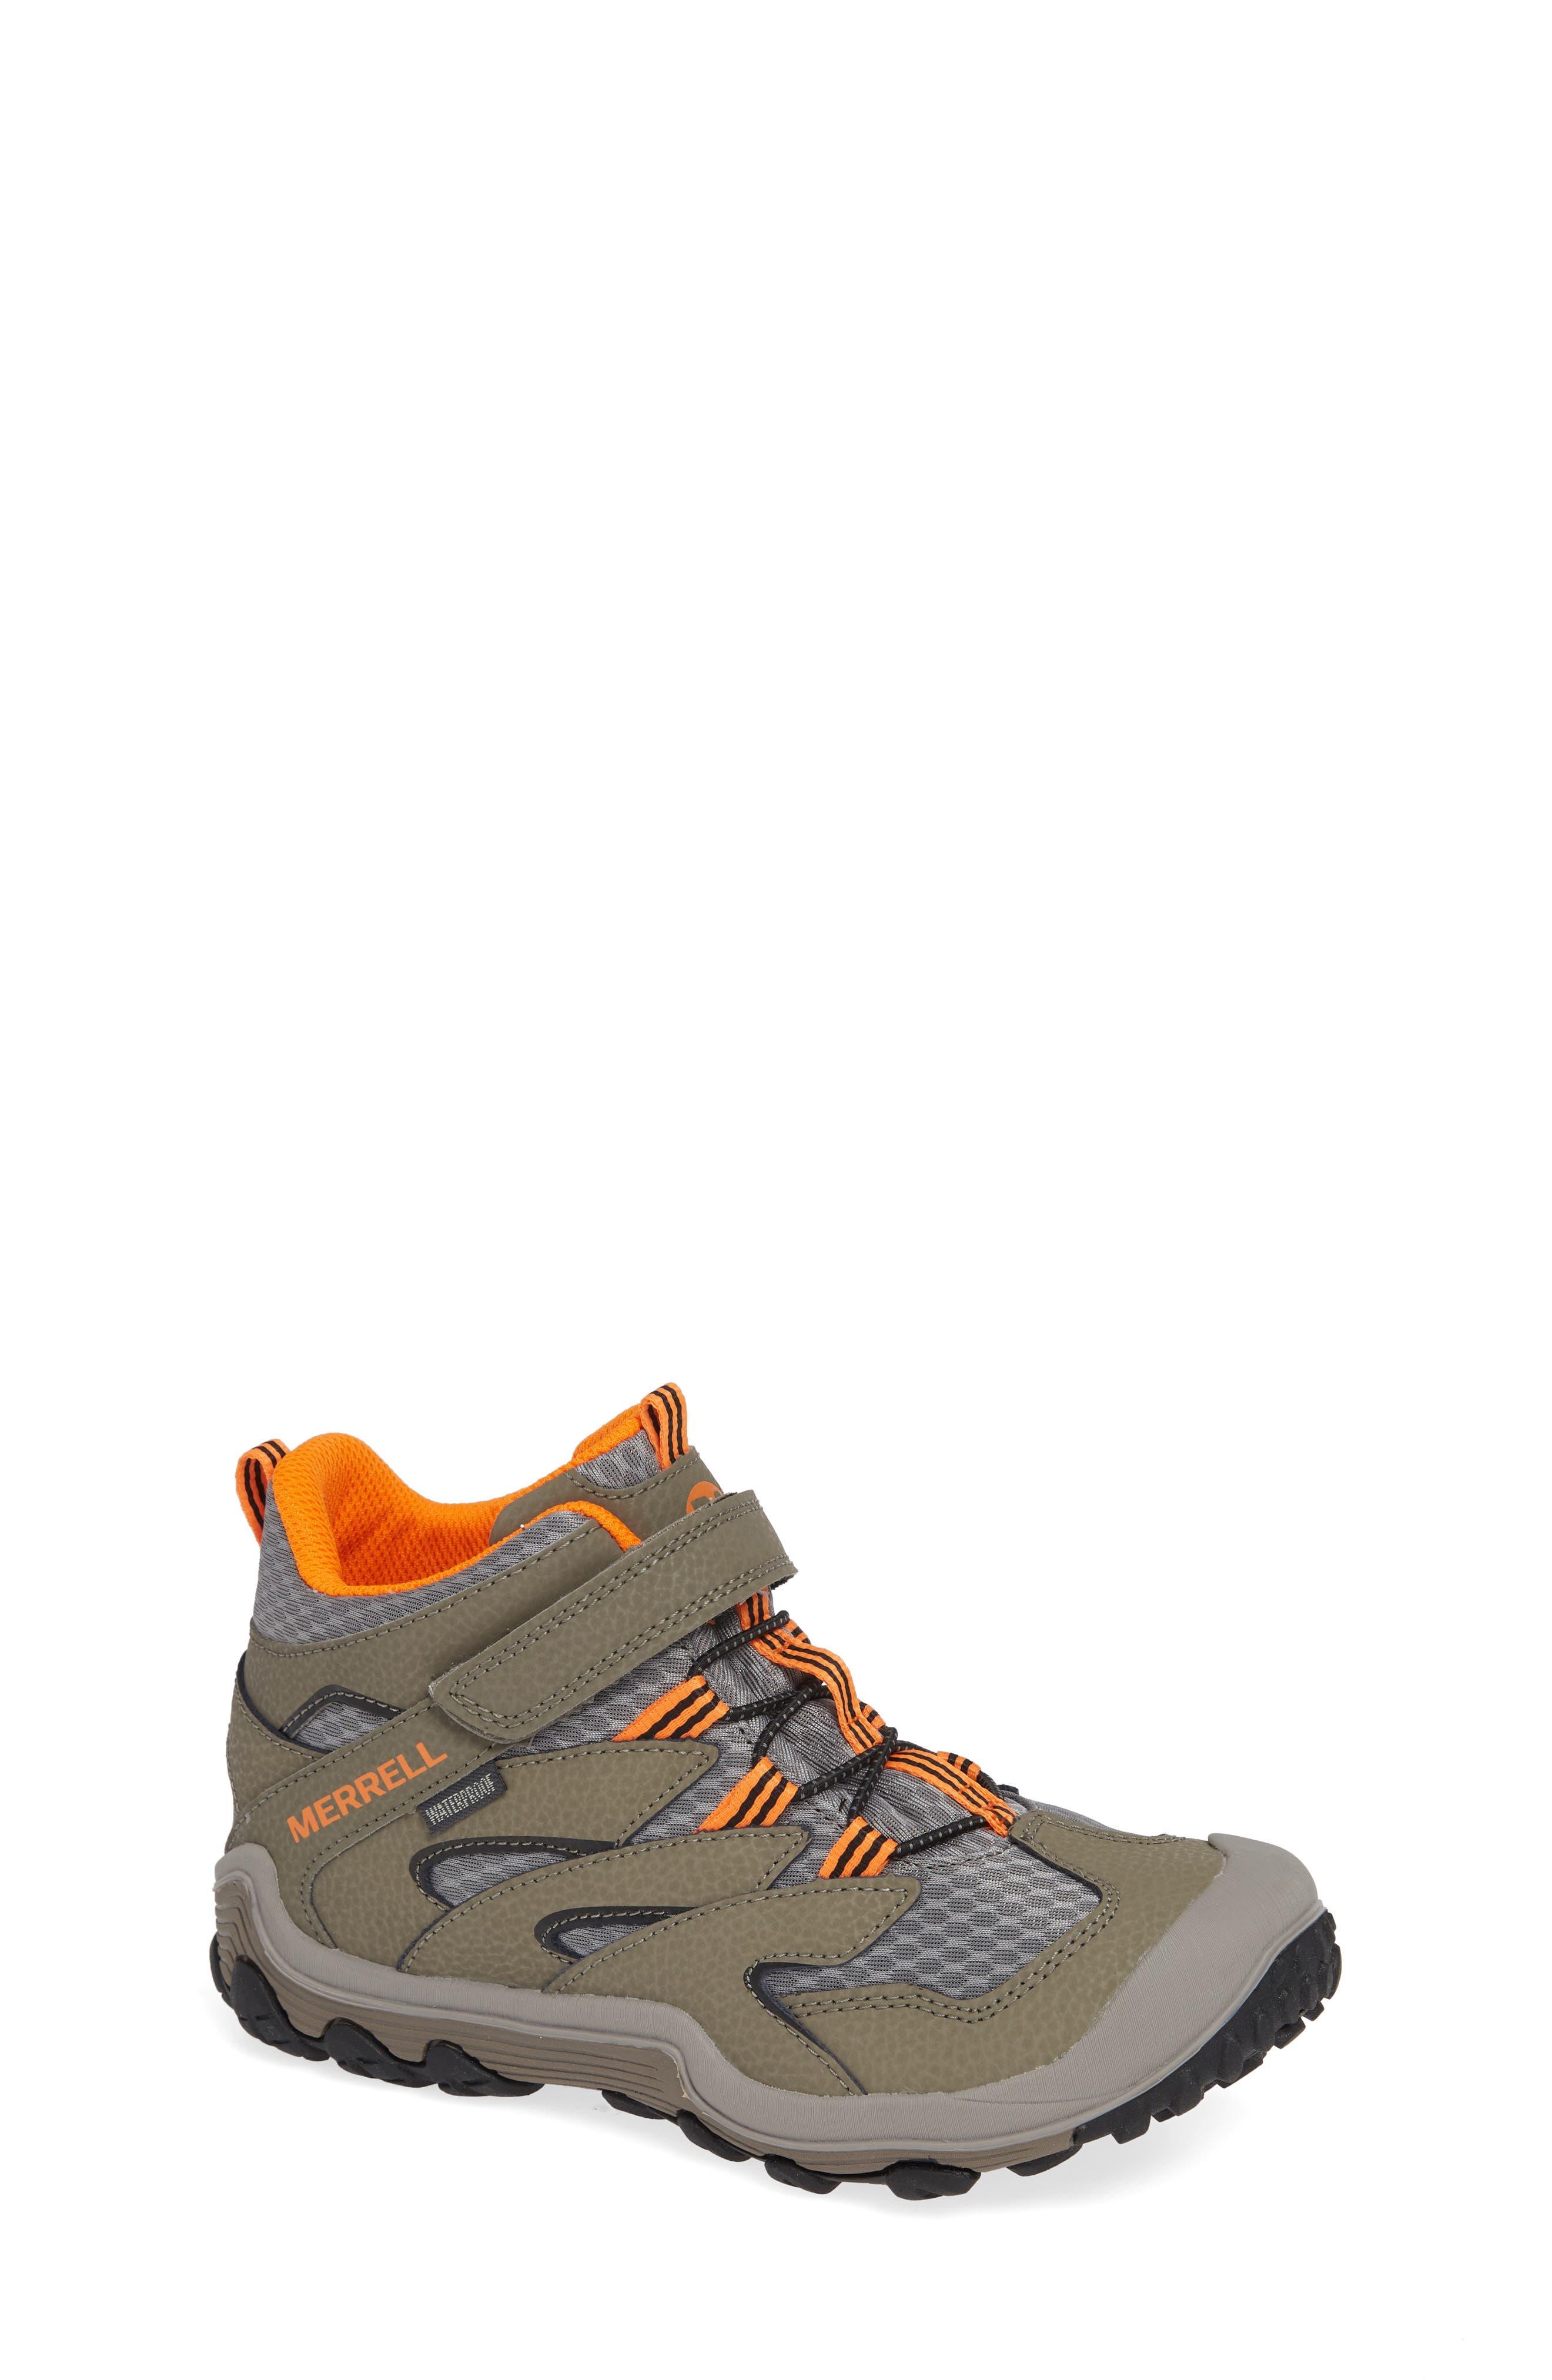 Chameleon 7 Mid Waterproof Boot,                             Main thumbnail 1, color,                             GUNSMOKE